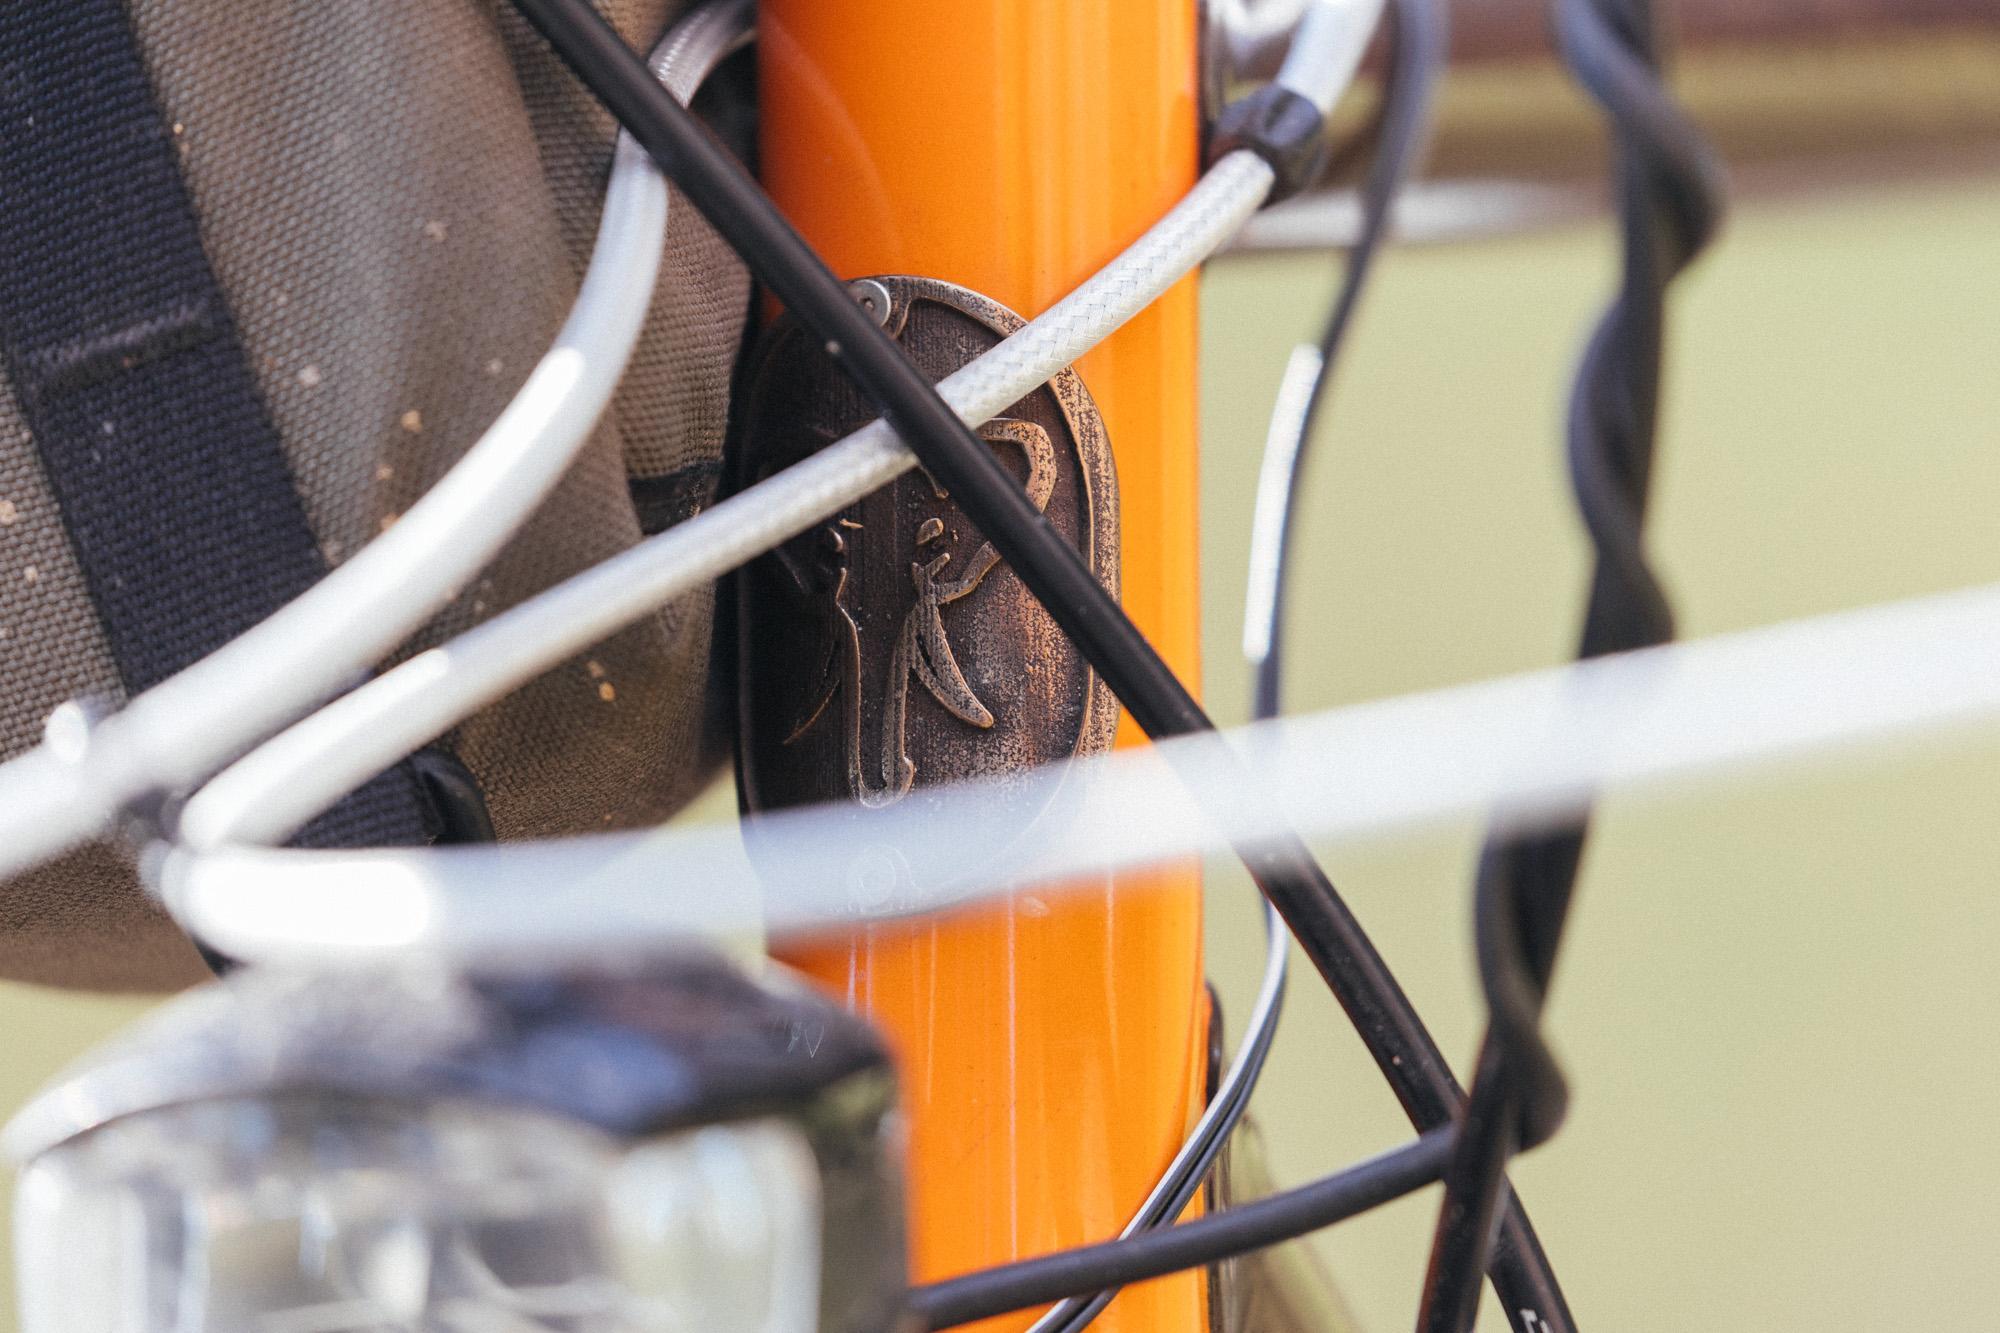 Bailey's Pachyderm Bikes Dirty 650b Tourer